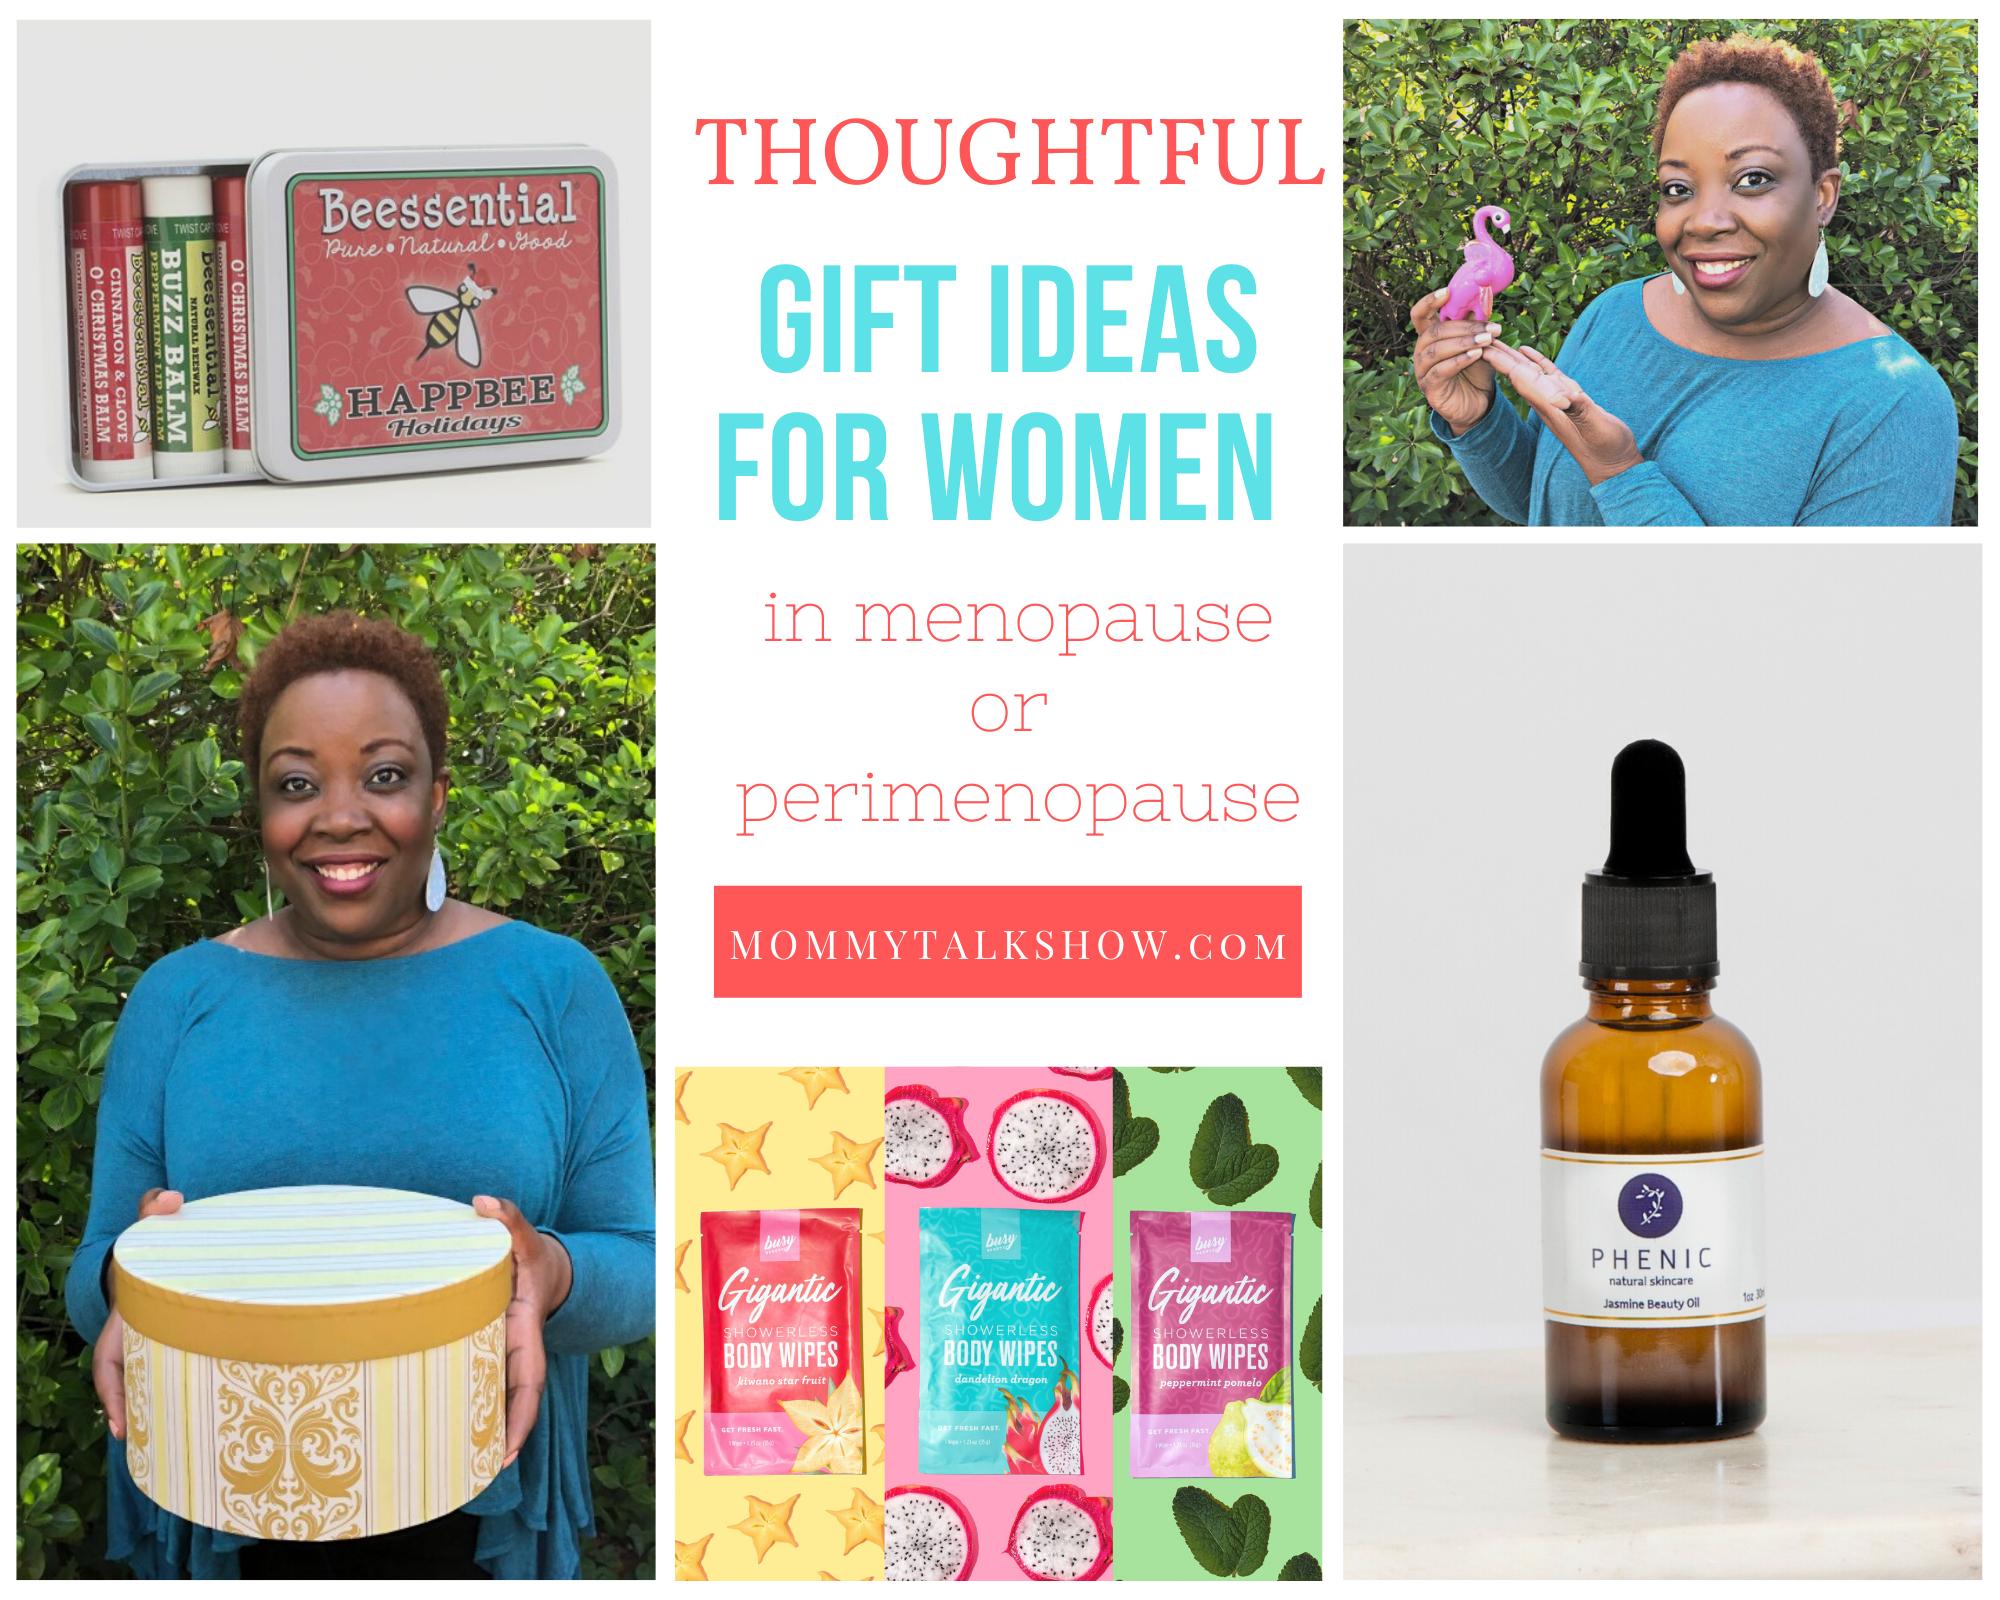 [VIDEO] Thoughtful Perimenopause & Menopause Gift Ideas